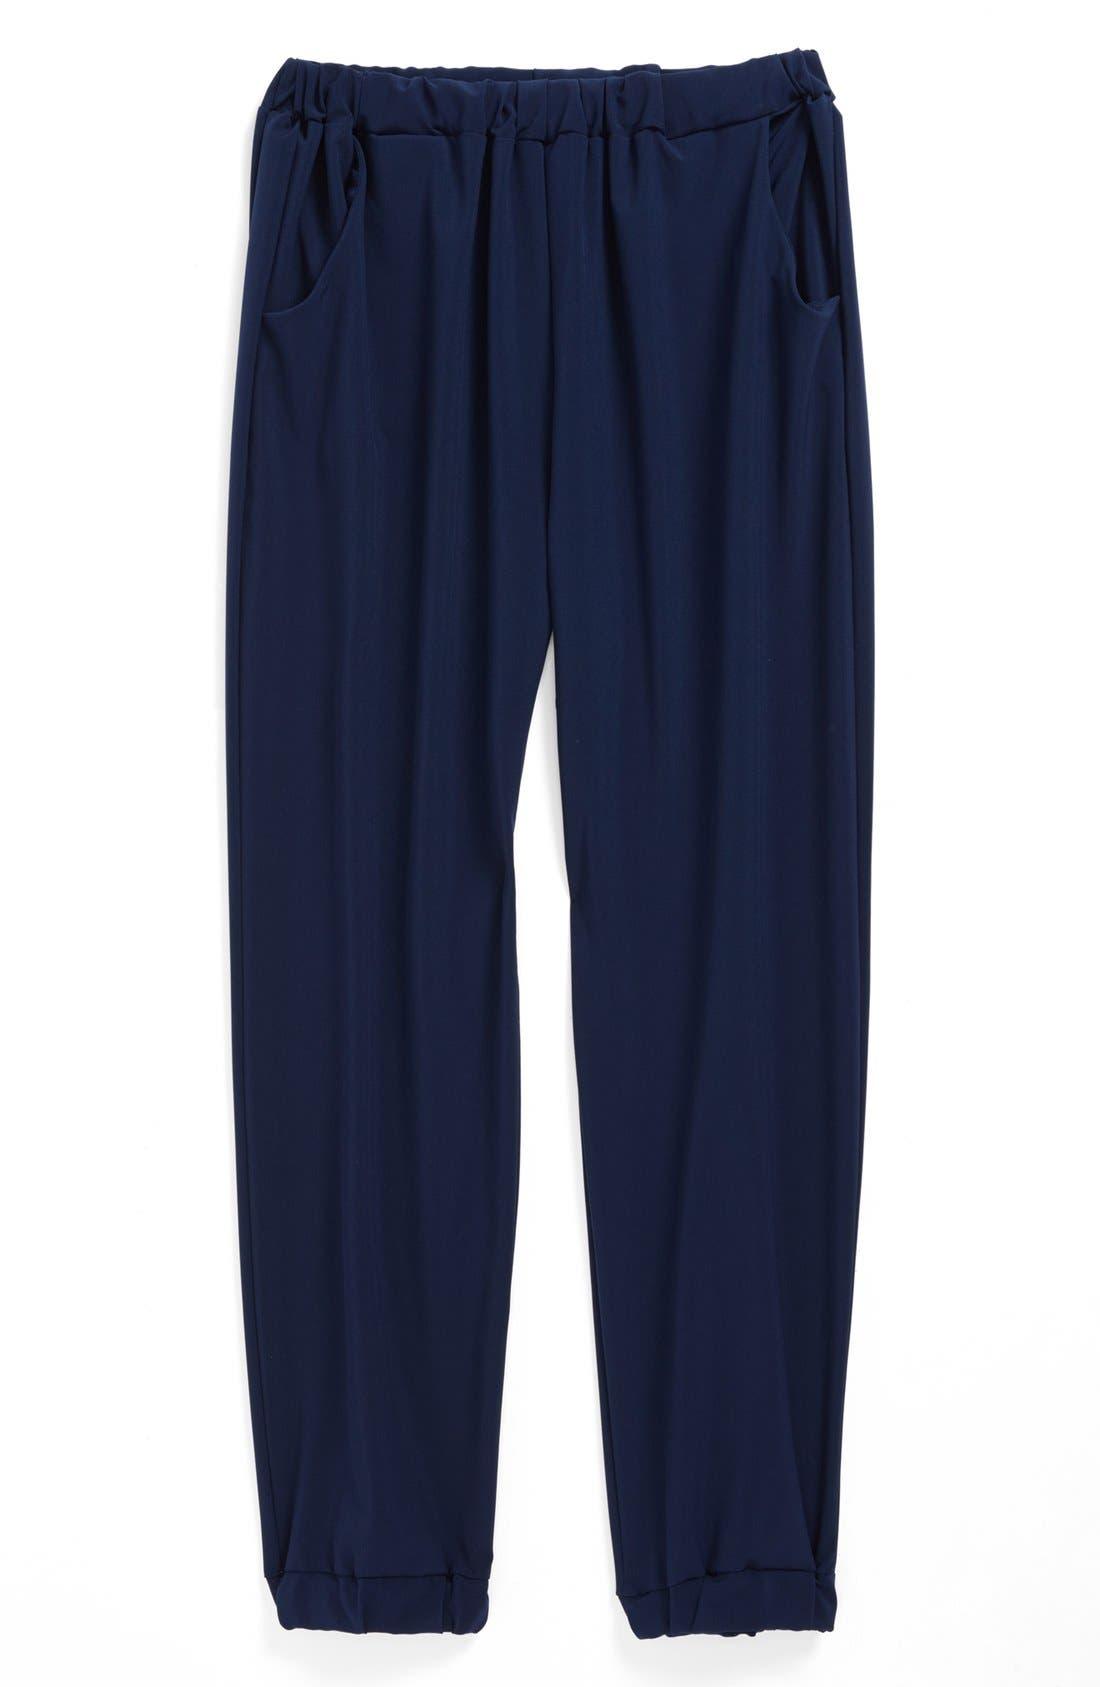 Main Image - Soprano Soft Pants (Big Girls)